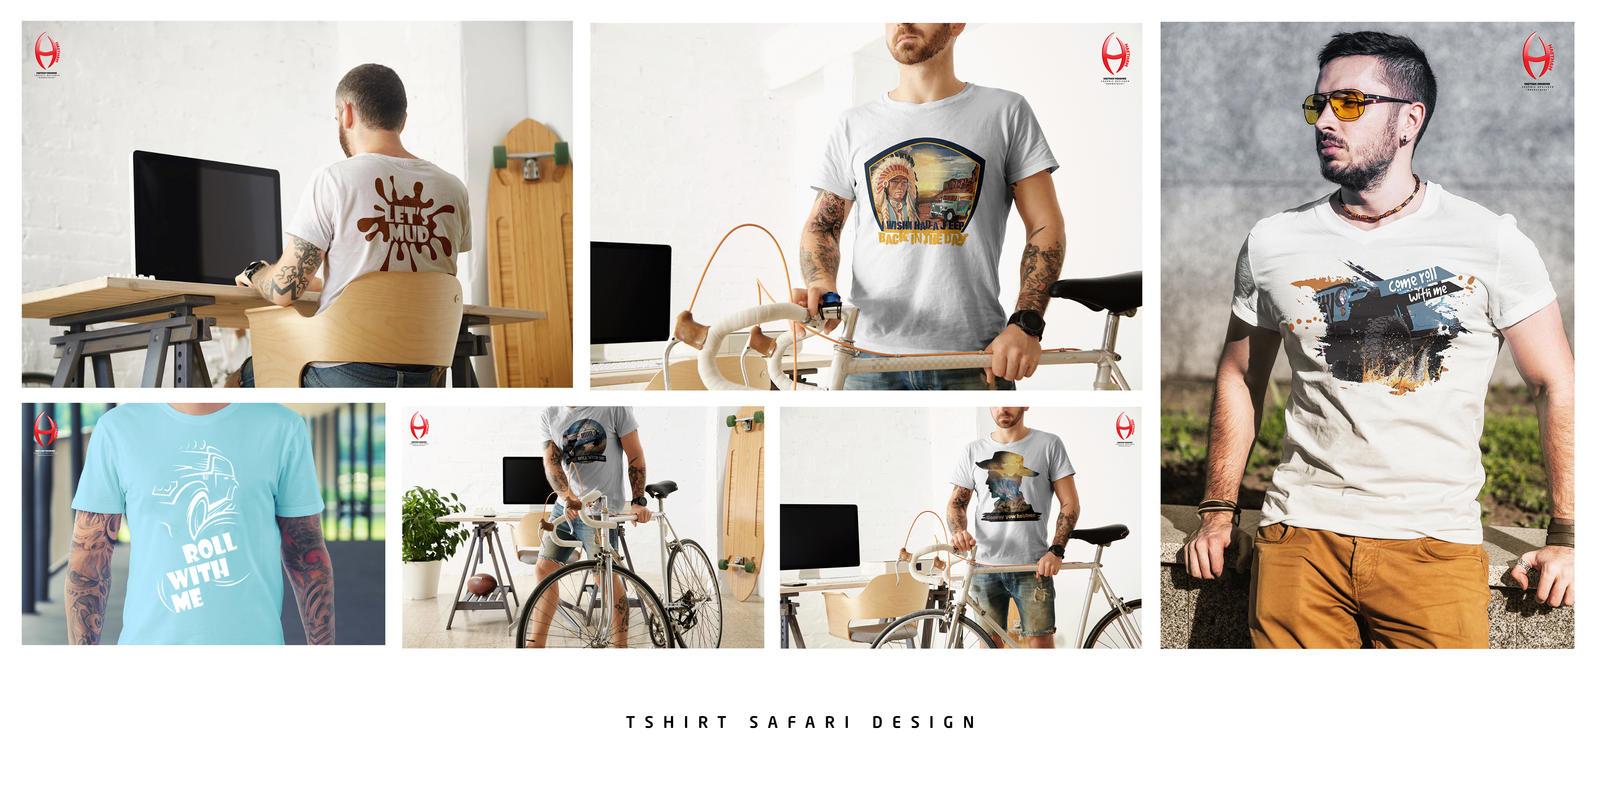 Safari Shirt Design | Safari T Shirt Design By Adobelover On Deviantart